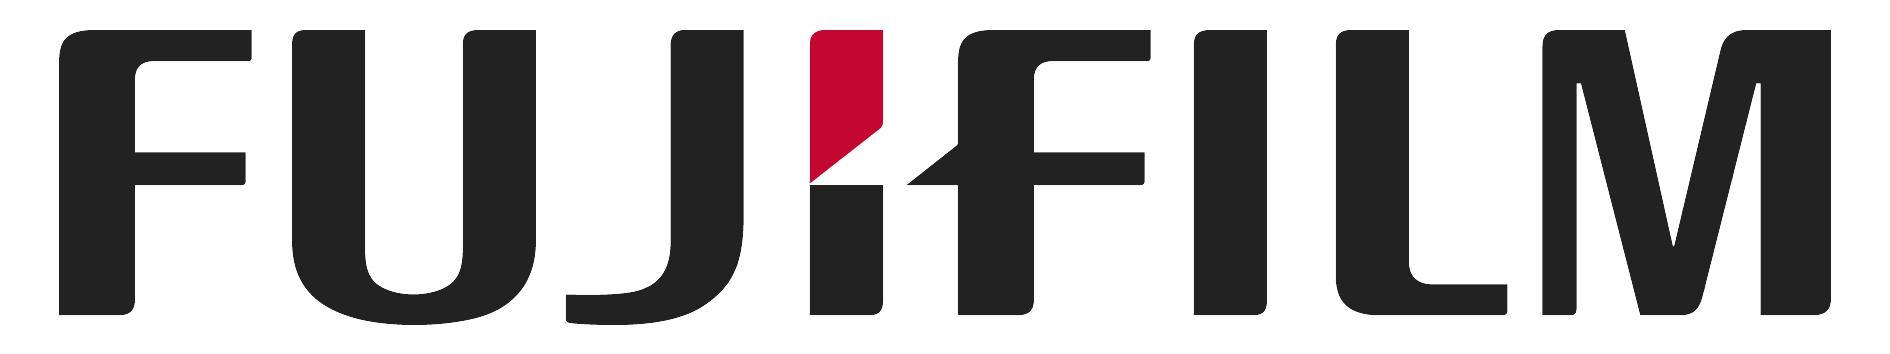 155_2017-06-09-logo-fujifilm-fond-blanc.jpg -